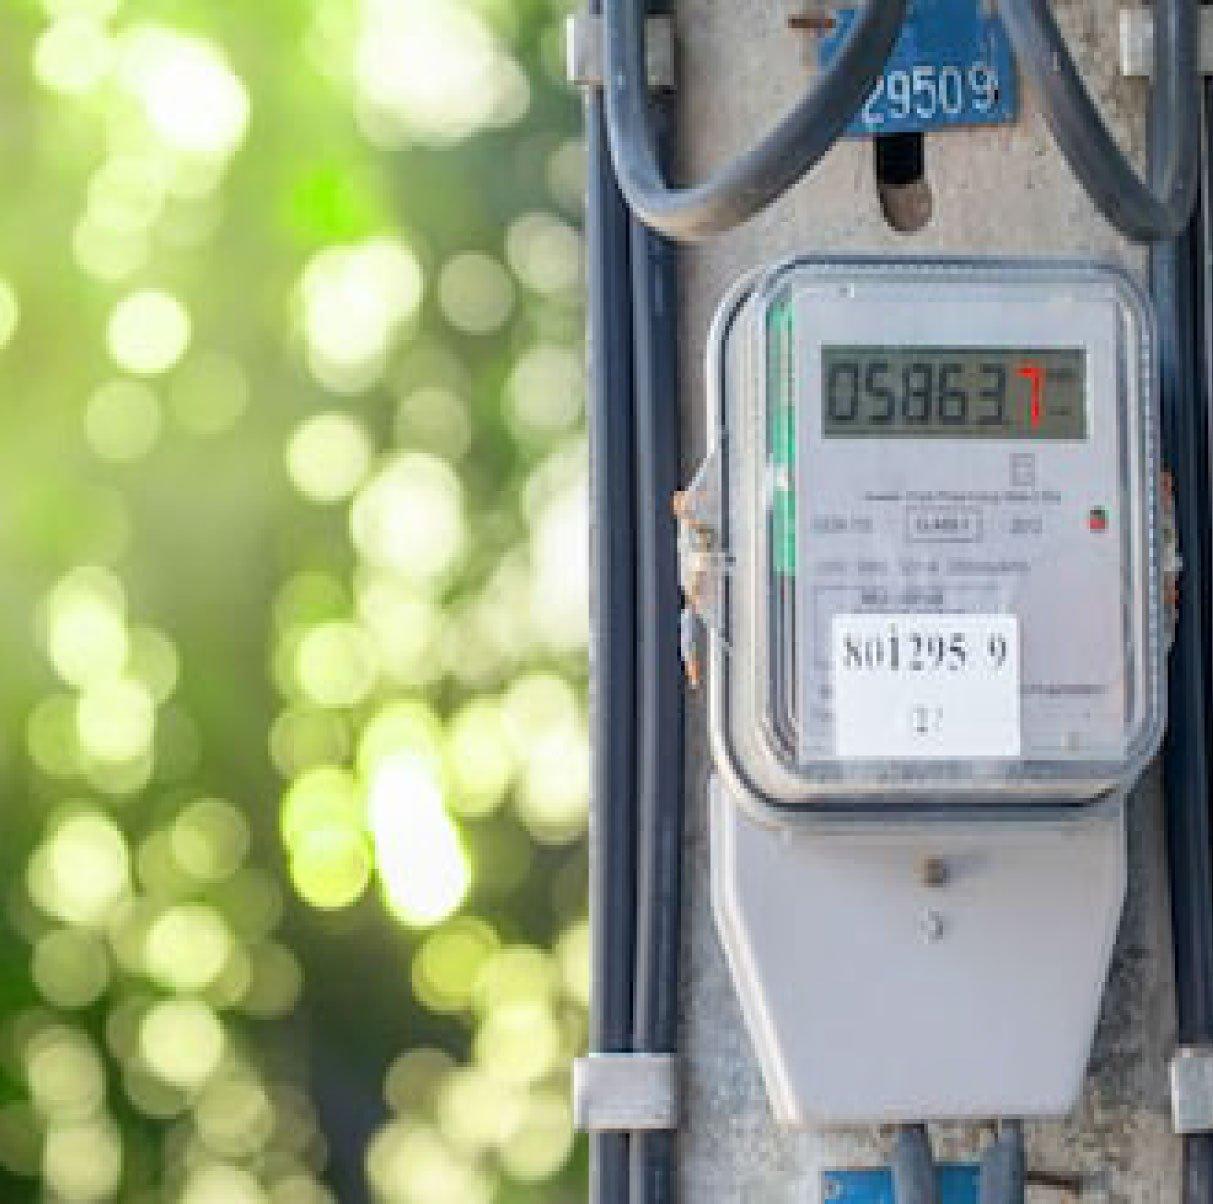 Energy Meter using Arduino